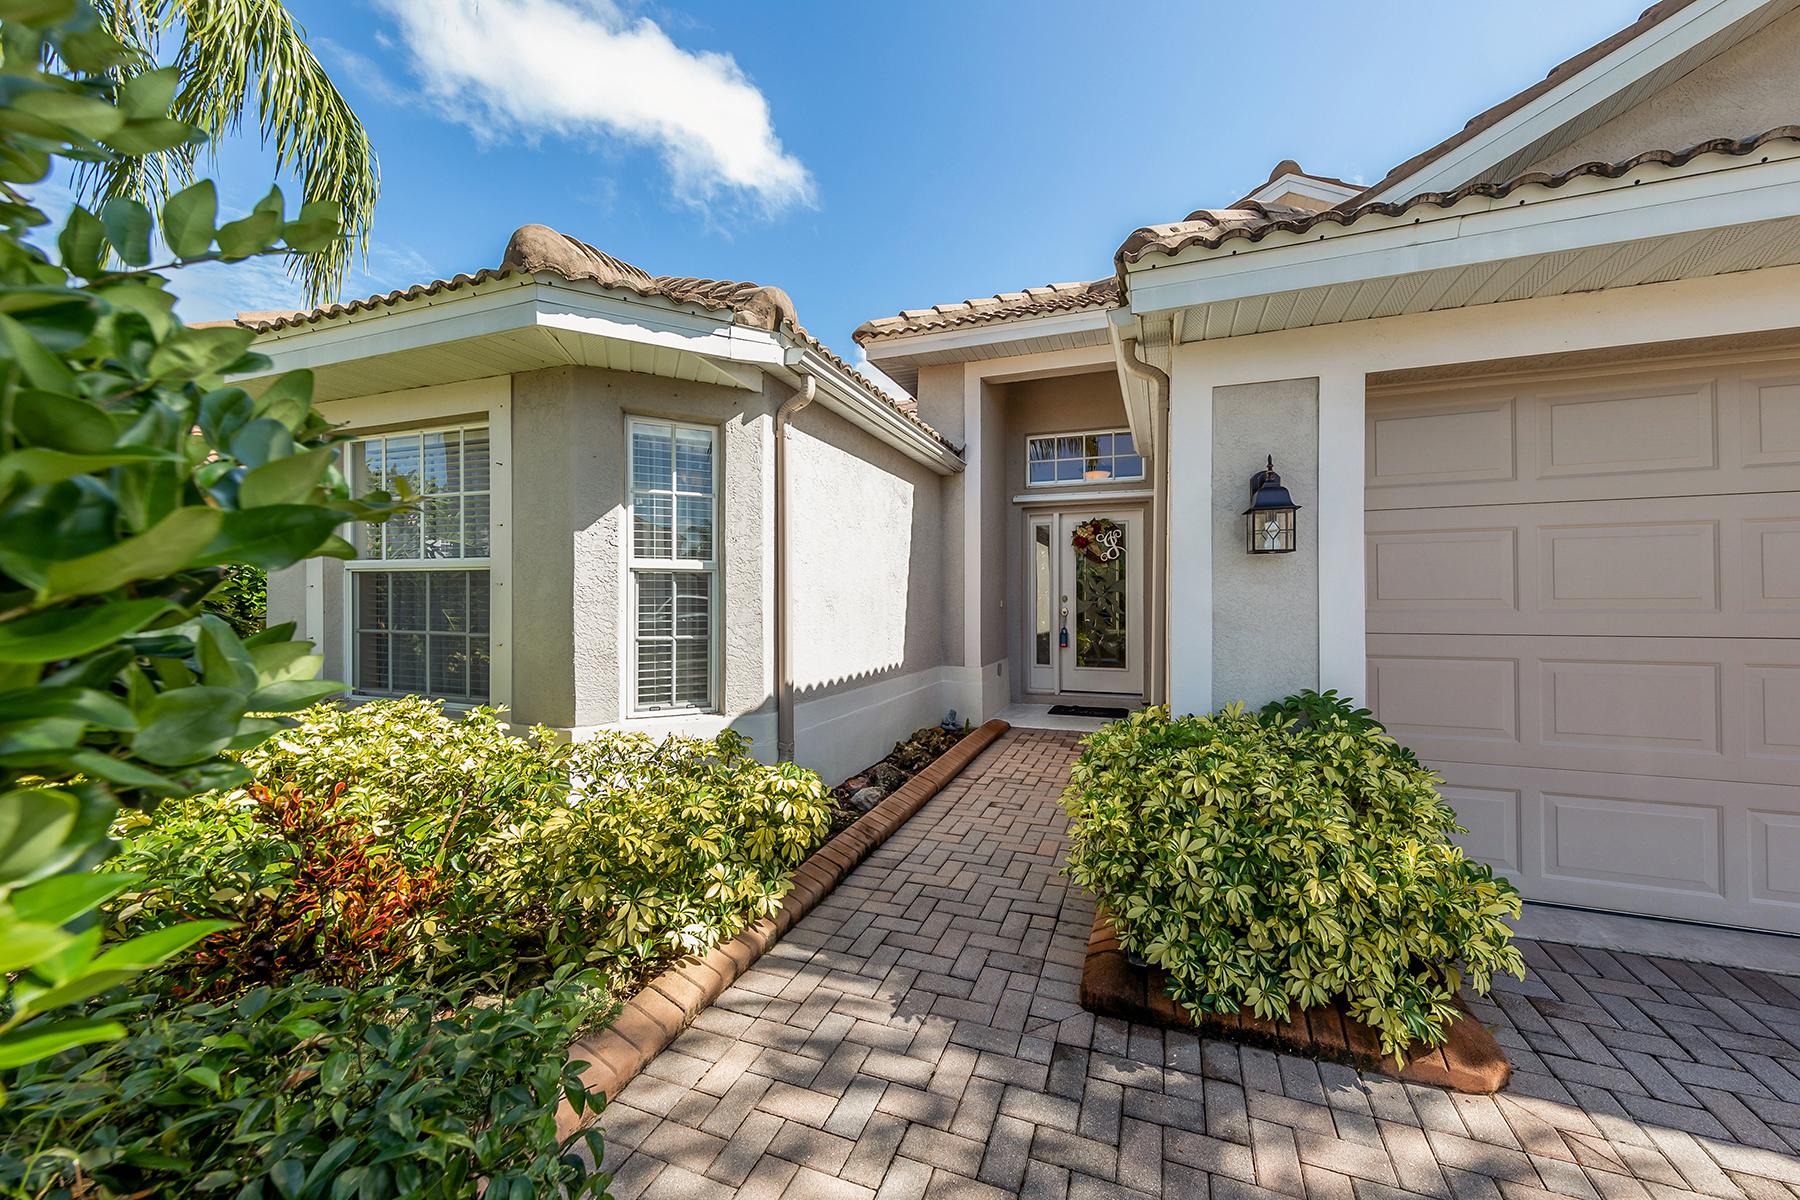 Single Family Homes for Sale at STONEYBROOK OF VENICE 2160 Mesic Hammock Way Venice, Florida 34292 United States